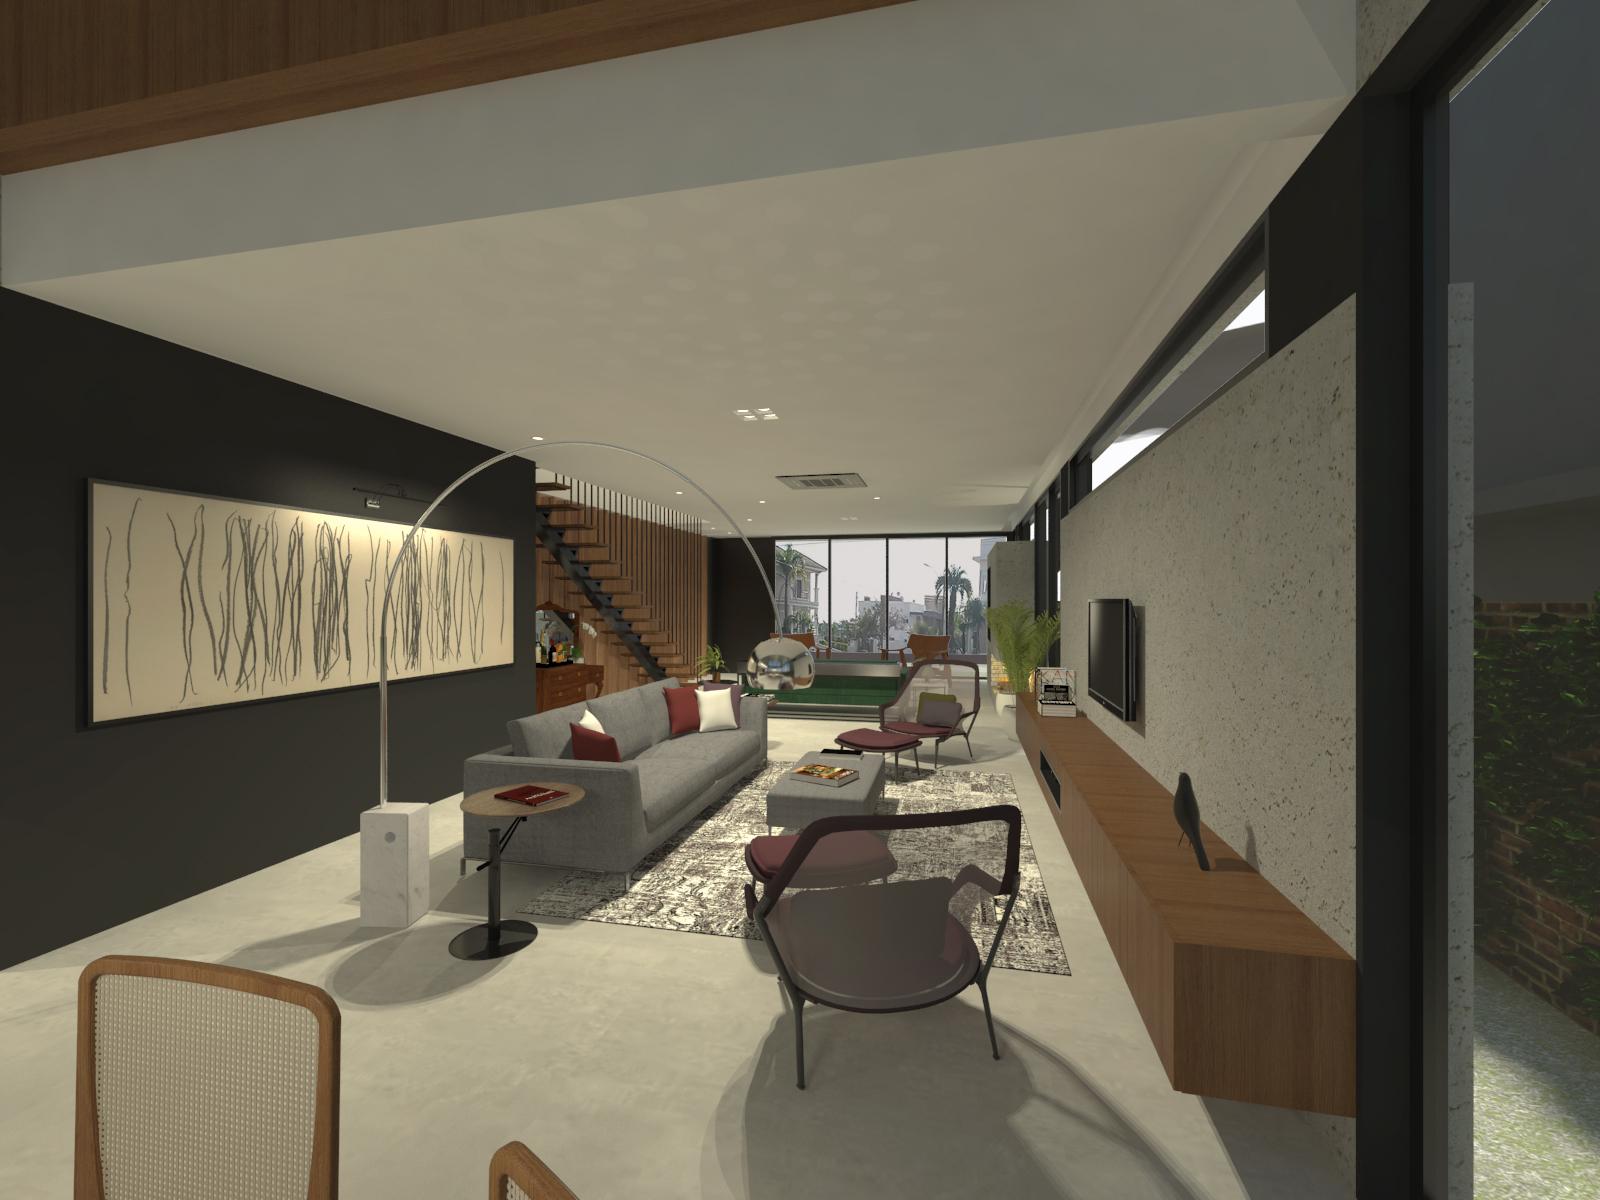 casa coracini | sala de estar e jantar